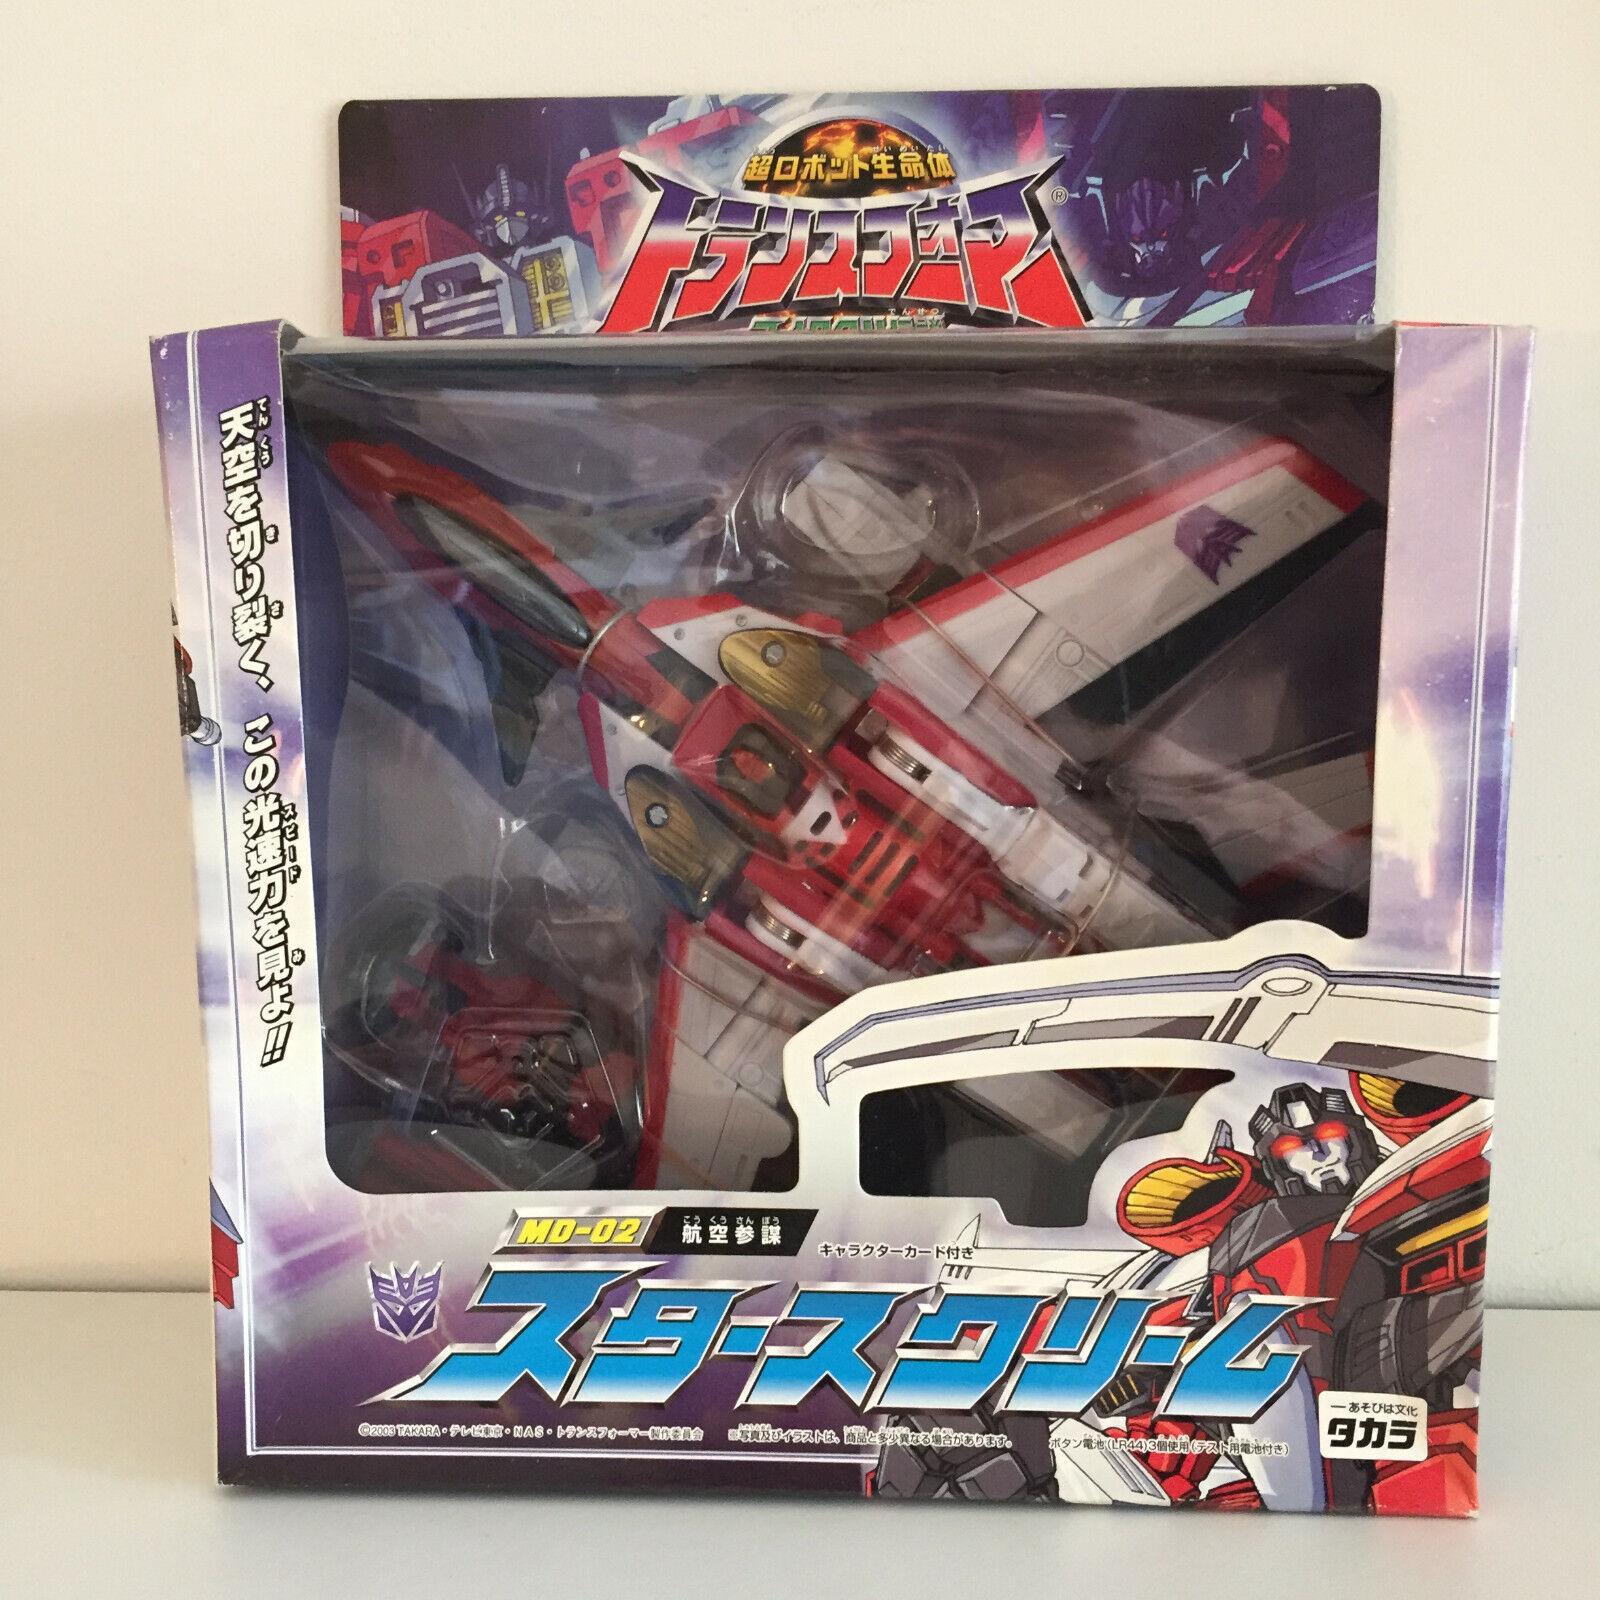 Takara Transformers Micron Legend MD-02 Starscream